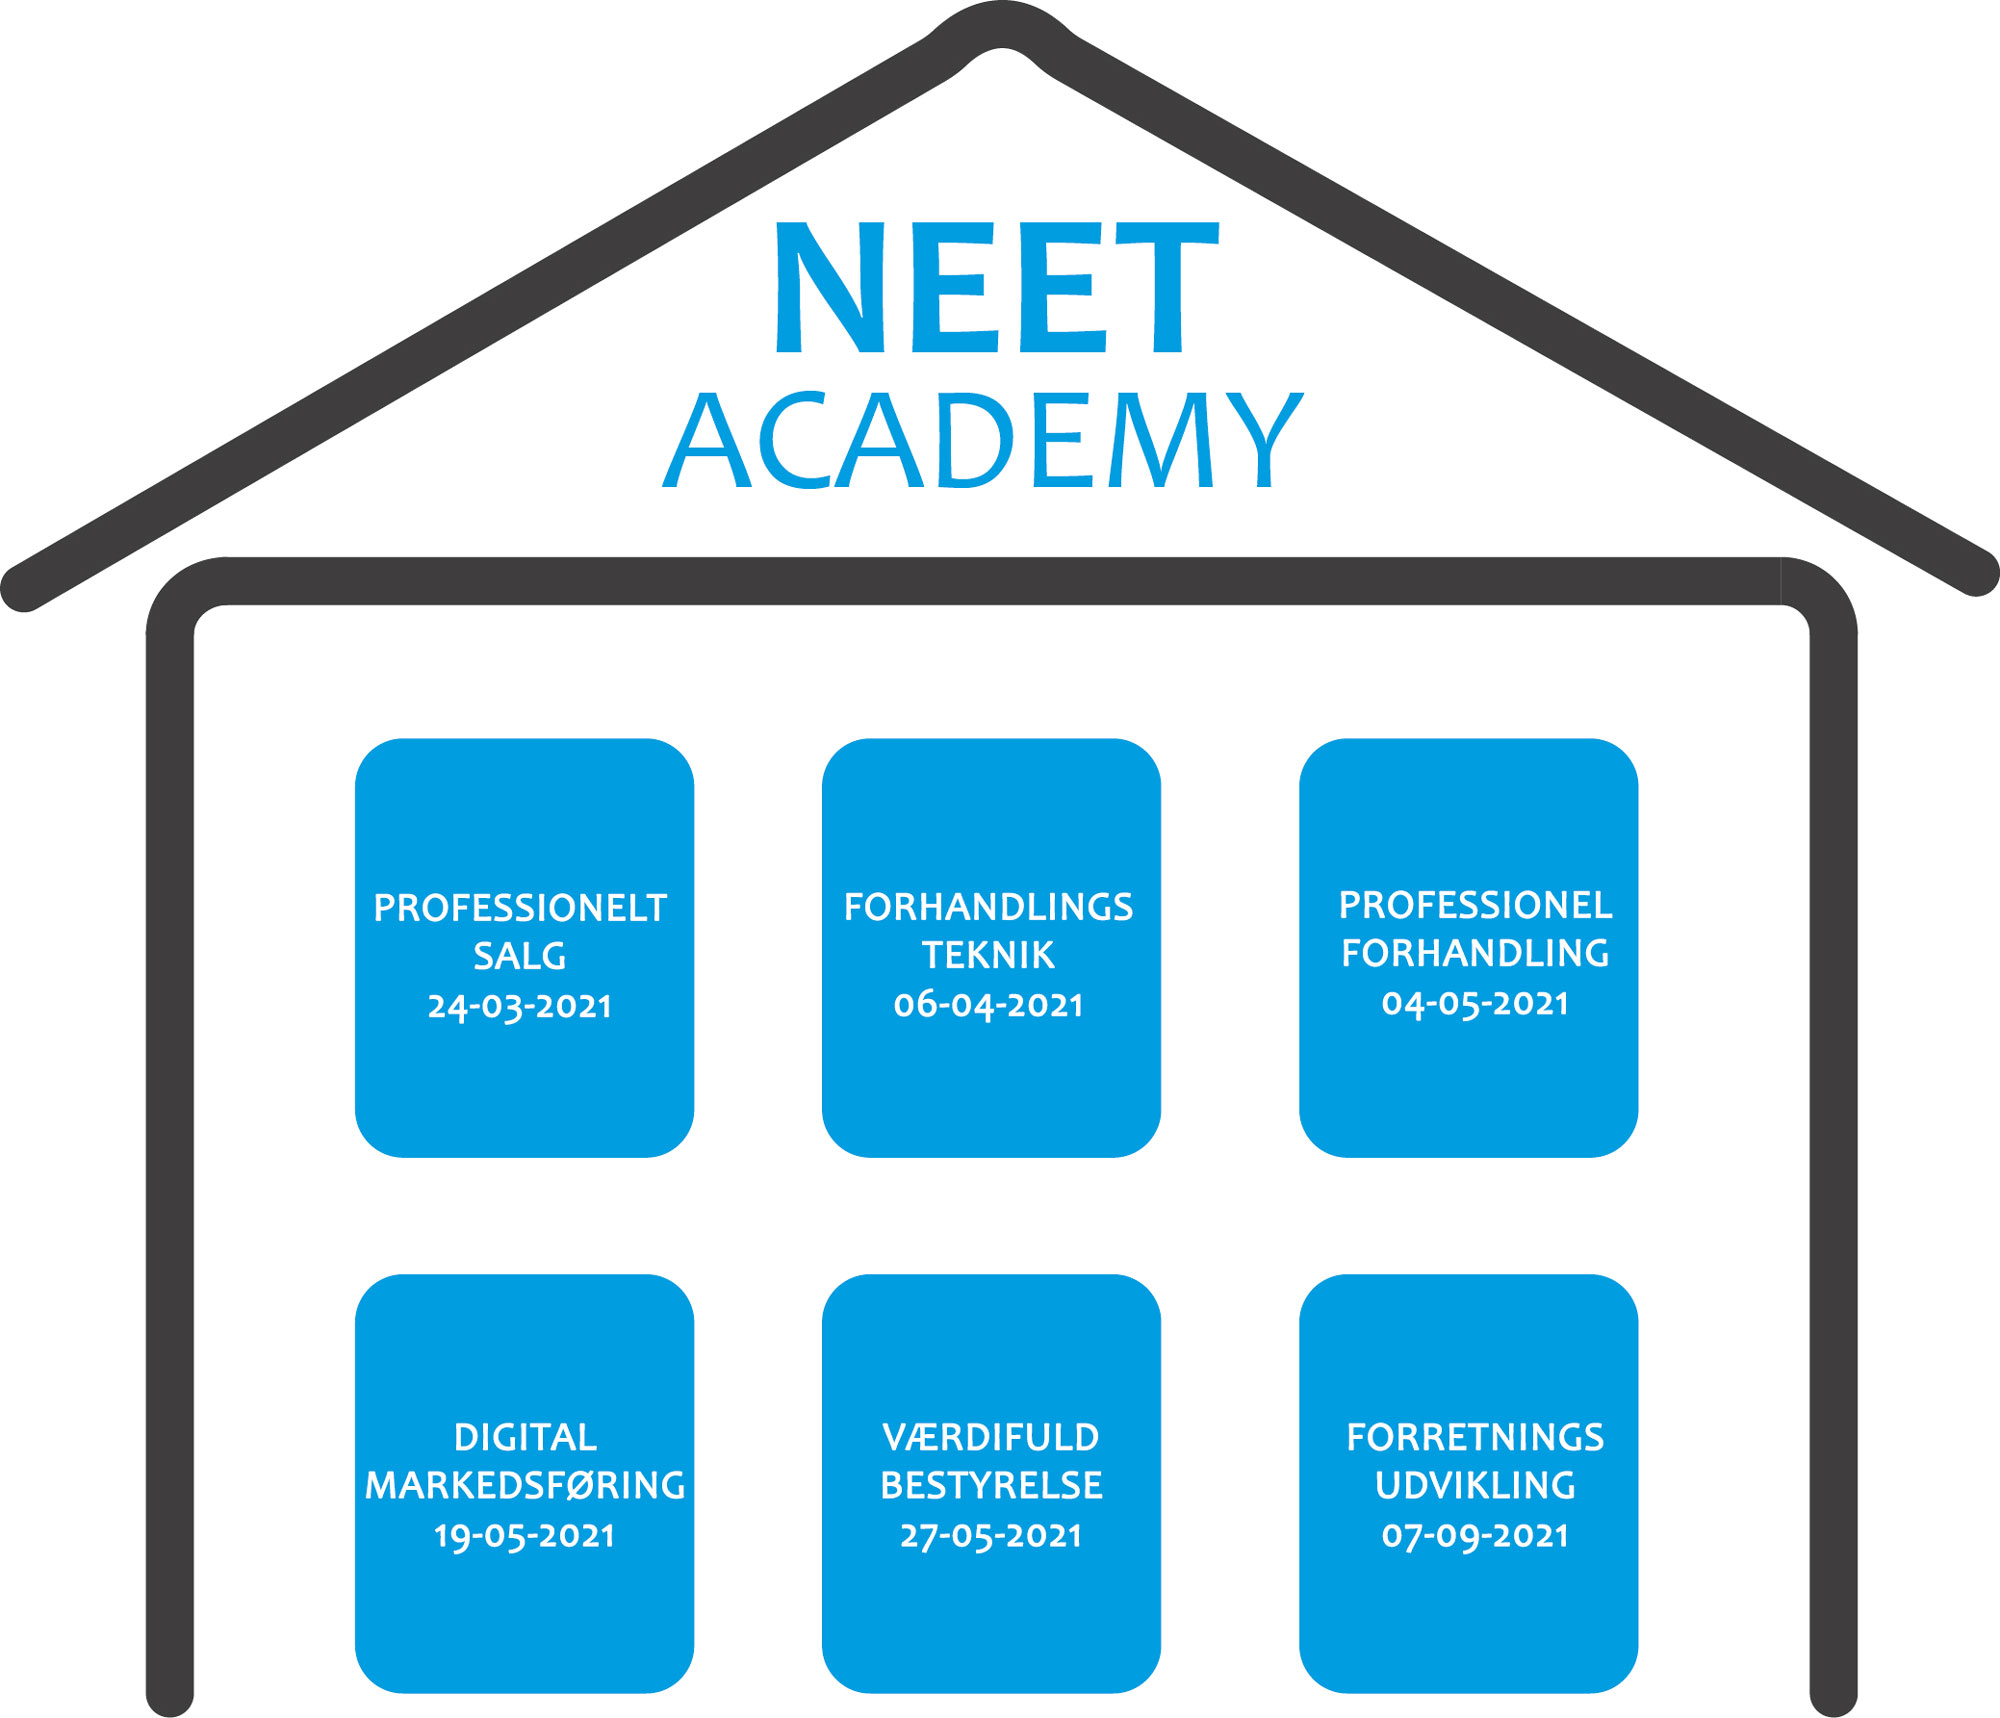 NEET Academy med tekster